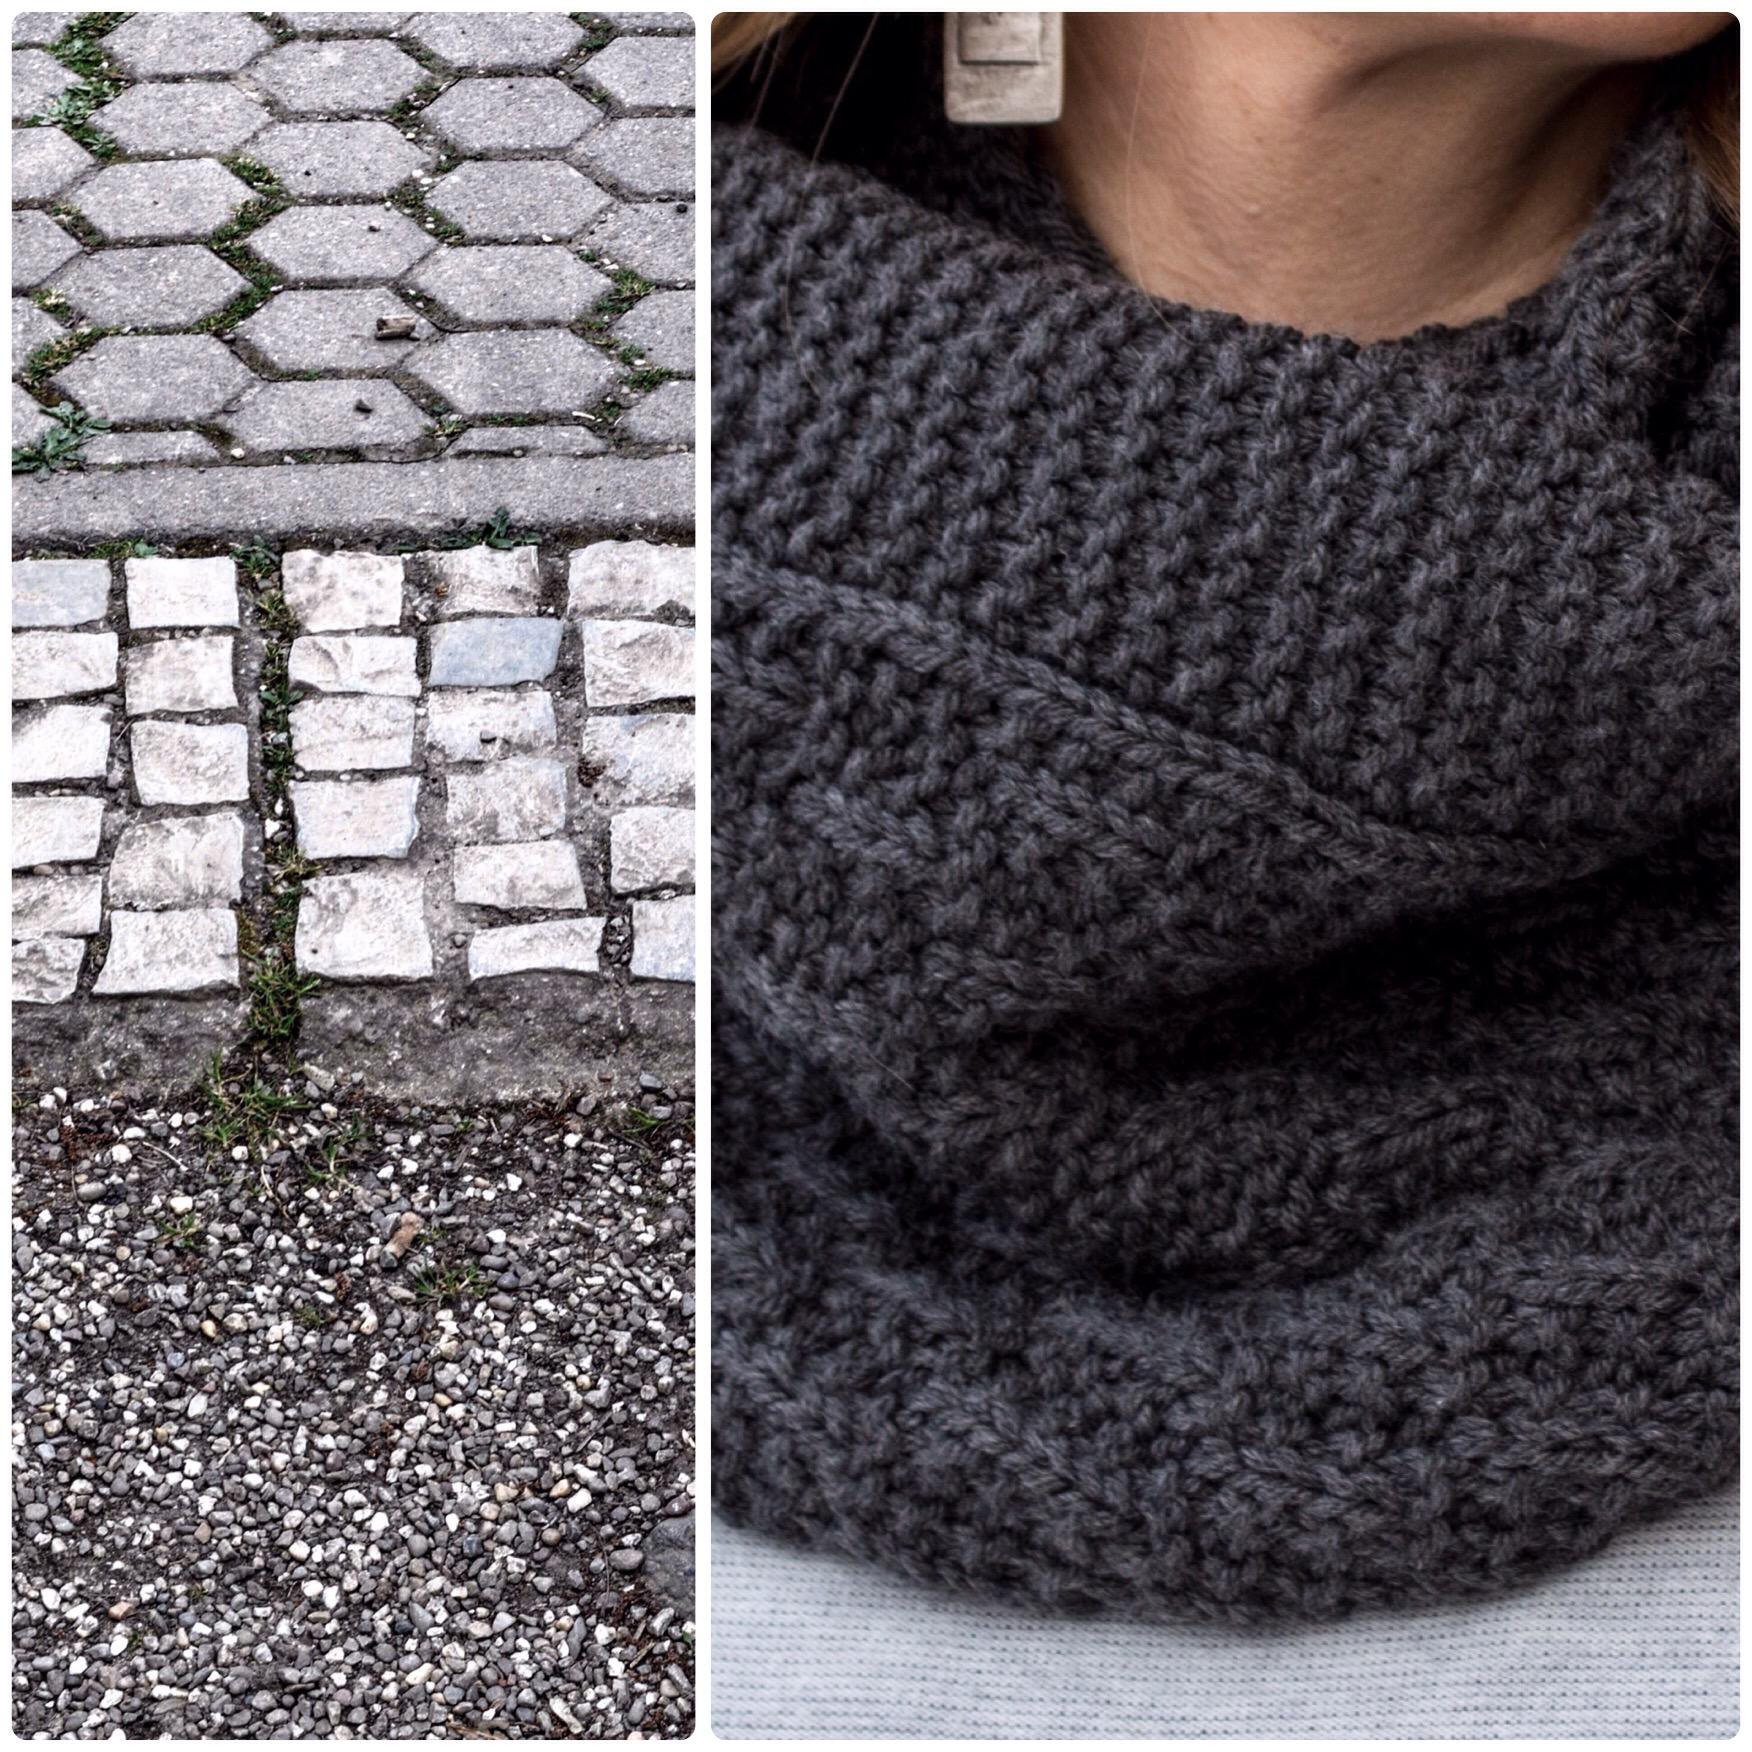 cobblestone cowl knitting pattern texture detail